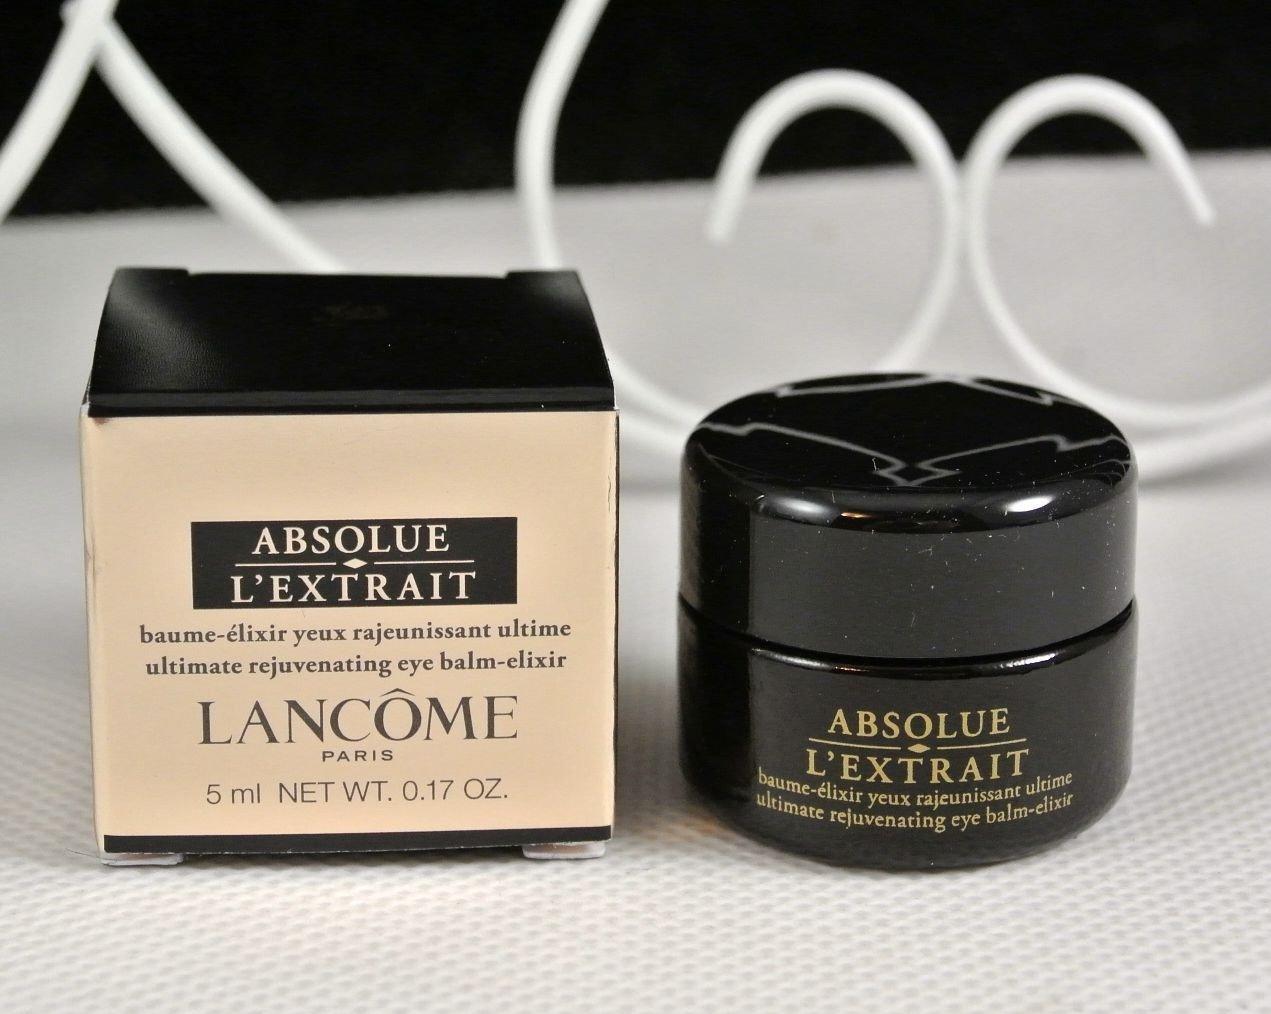 $87 Value Absolue L'Extrait Ultimate Eye Contour Rejuvenating Eye Balm-Elixir 5 ml/0.17 oz. Deluxe Travel Size